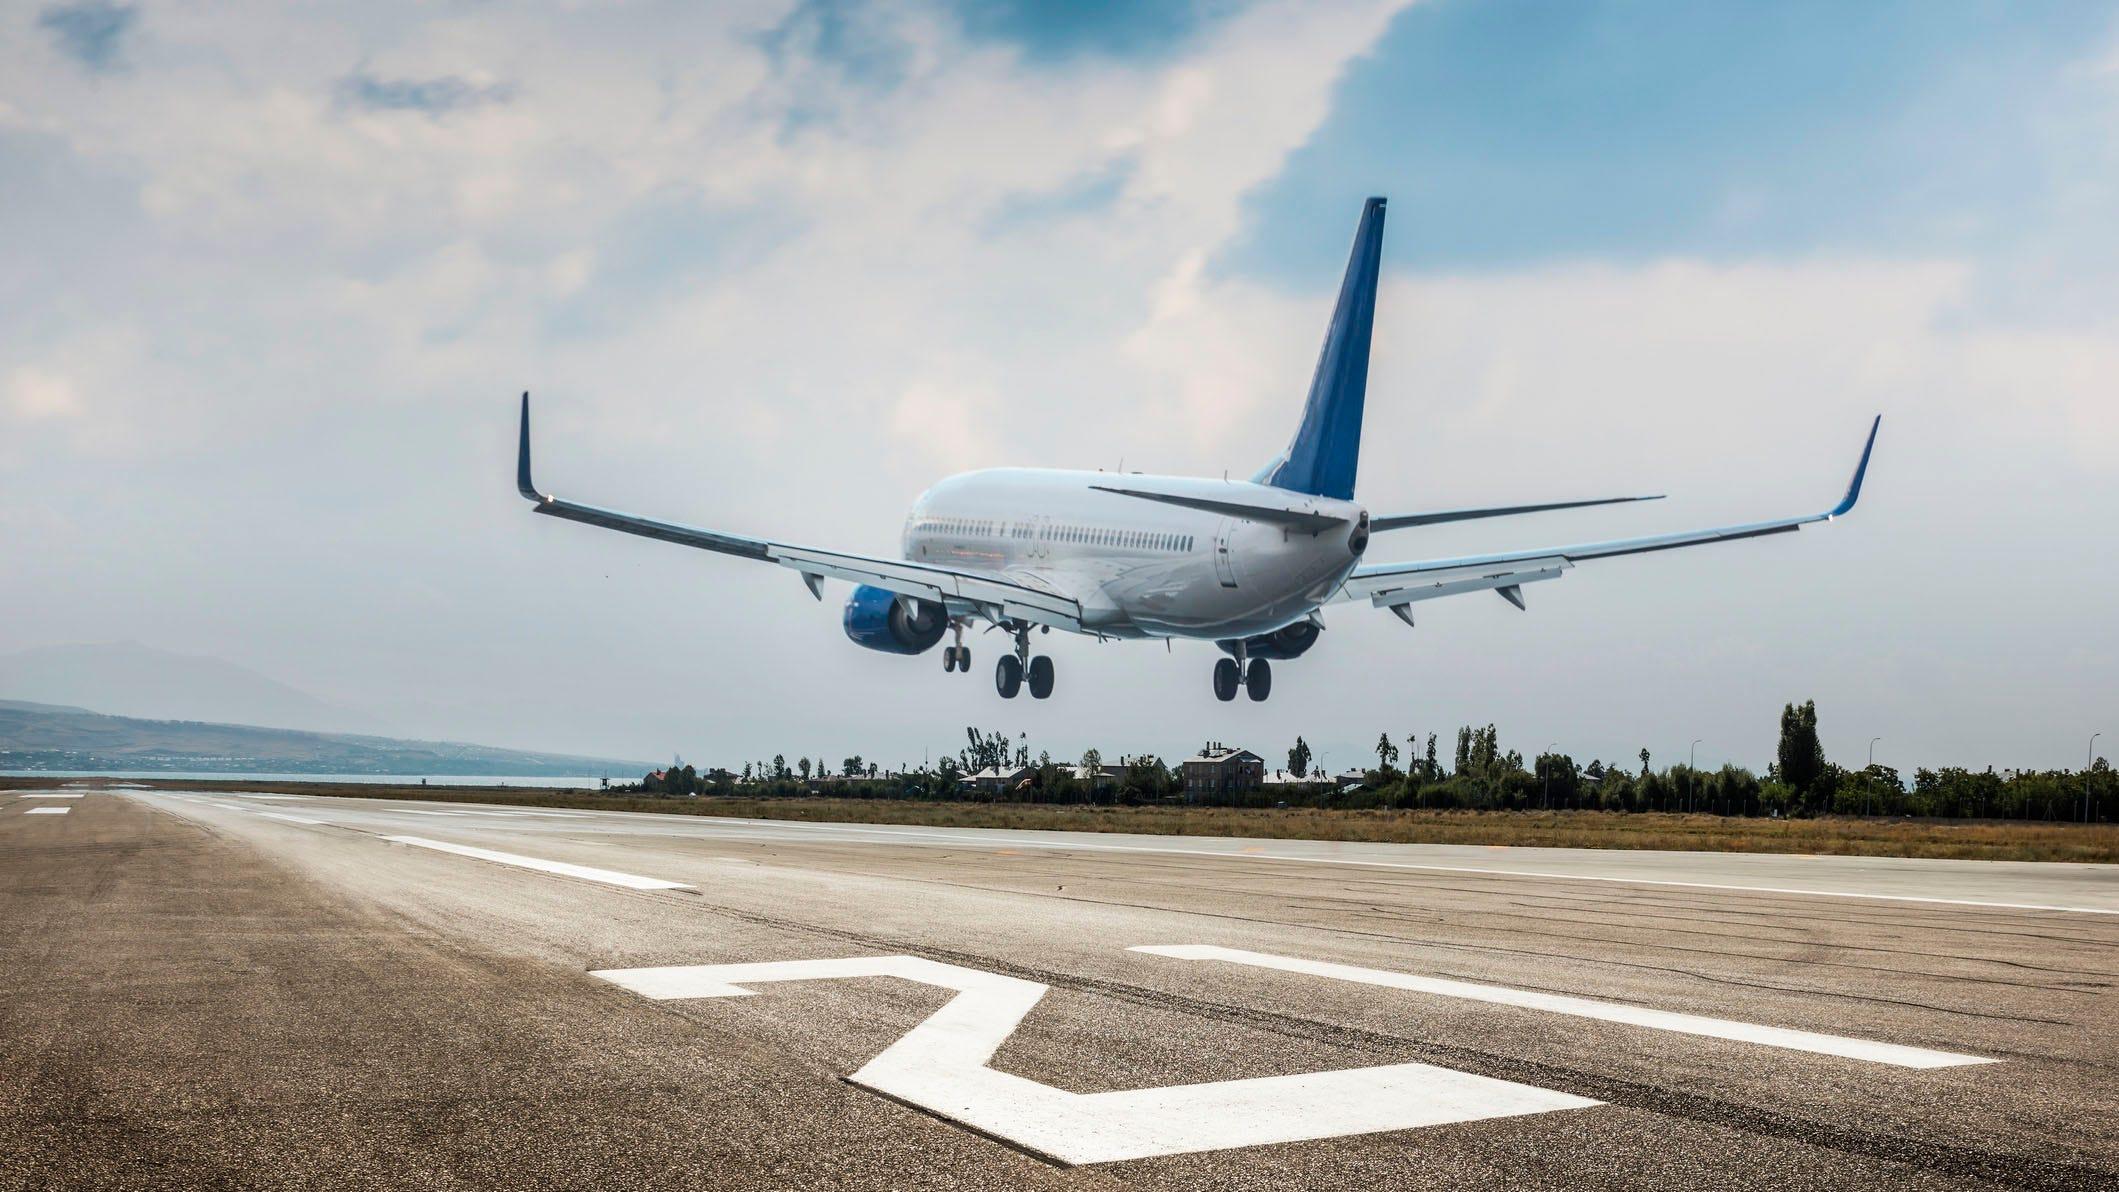 Netherlands proposes ban on flights, curfew to combat coronavirus